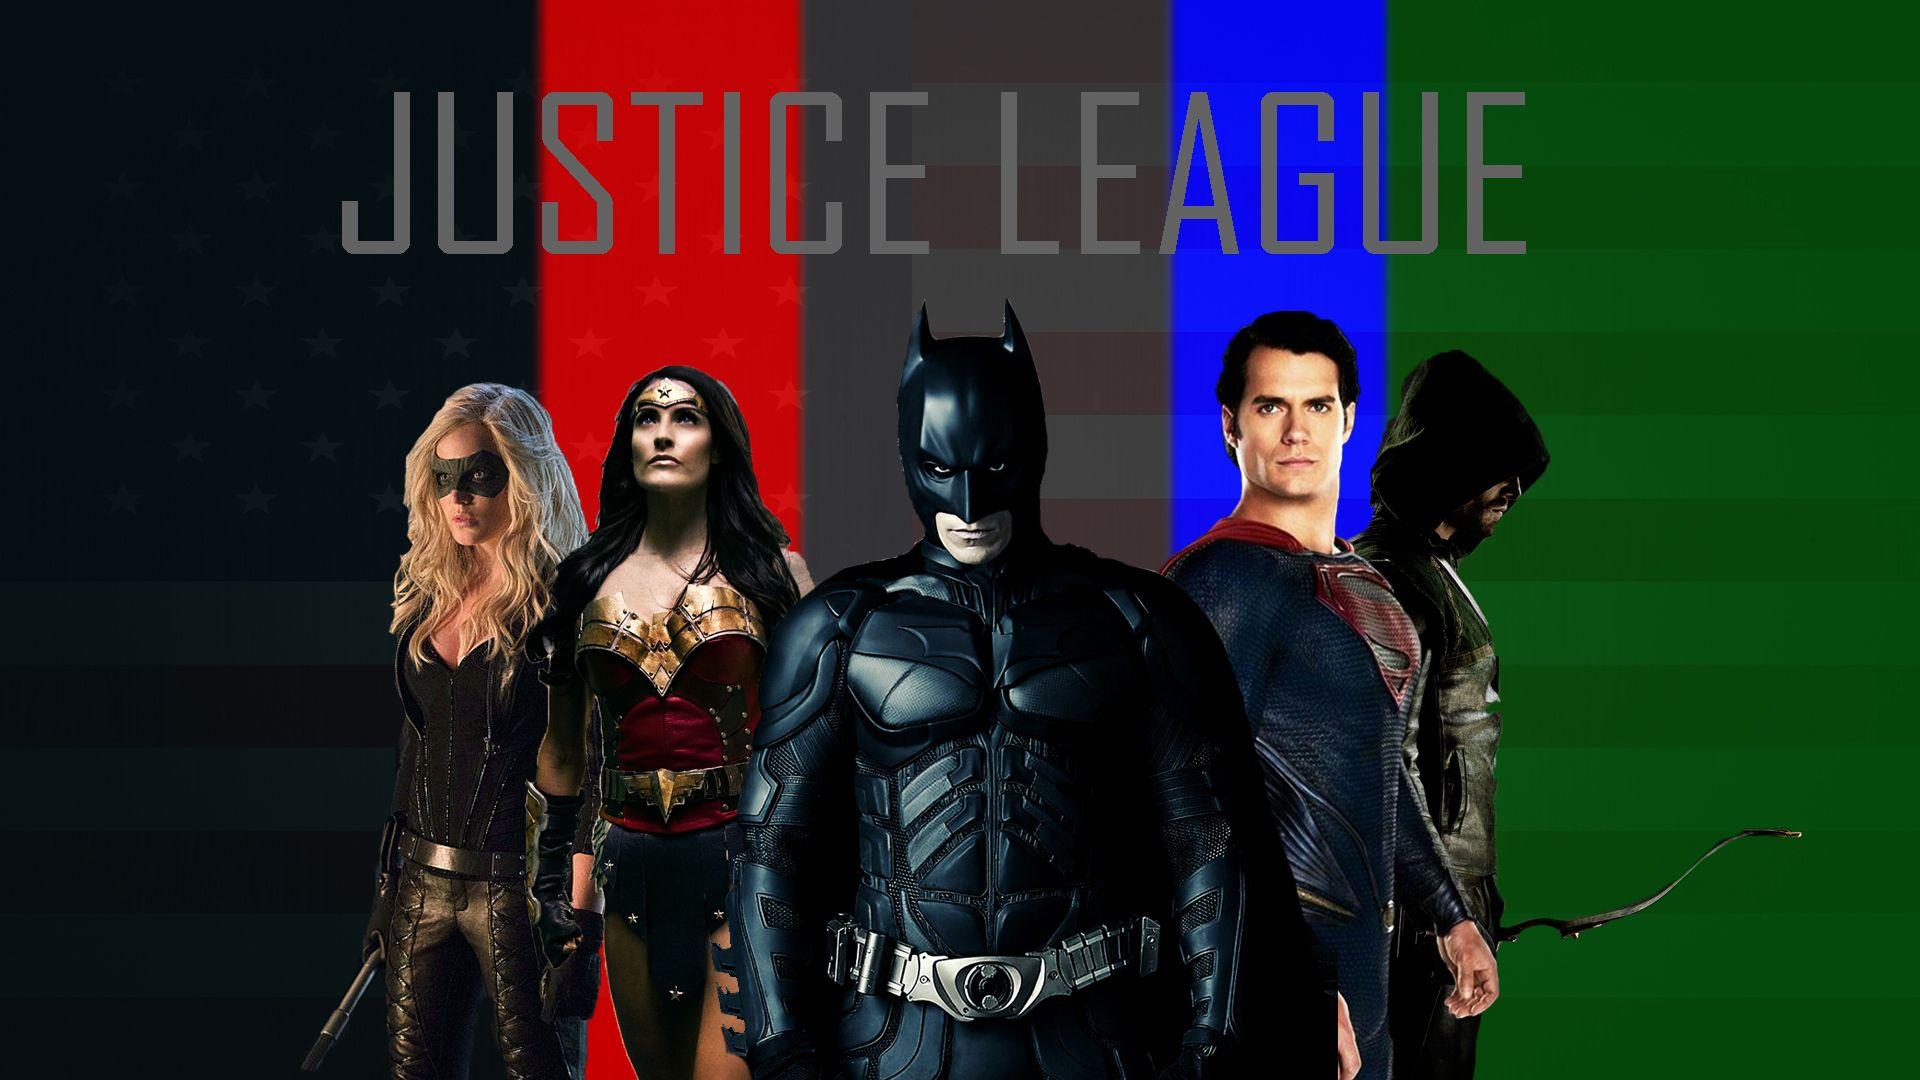 Cool Wallpaper Movie Justice League - 56ef7acd5a300e59721d4d734c632543  Photograph_725783.jpg